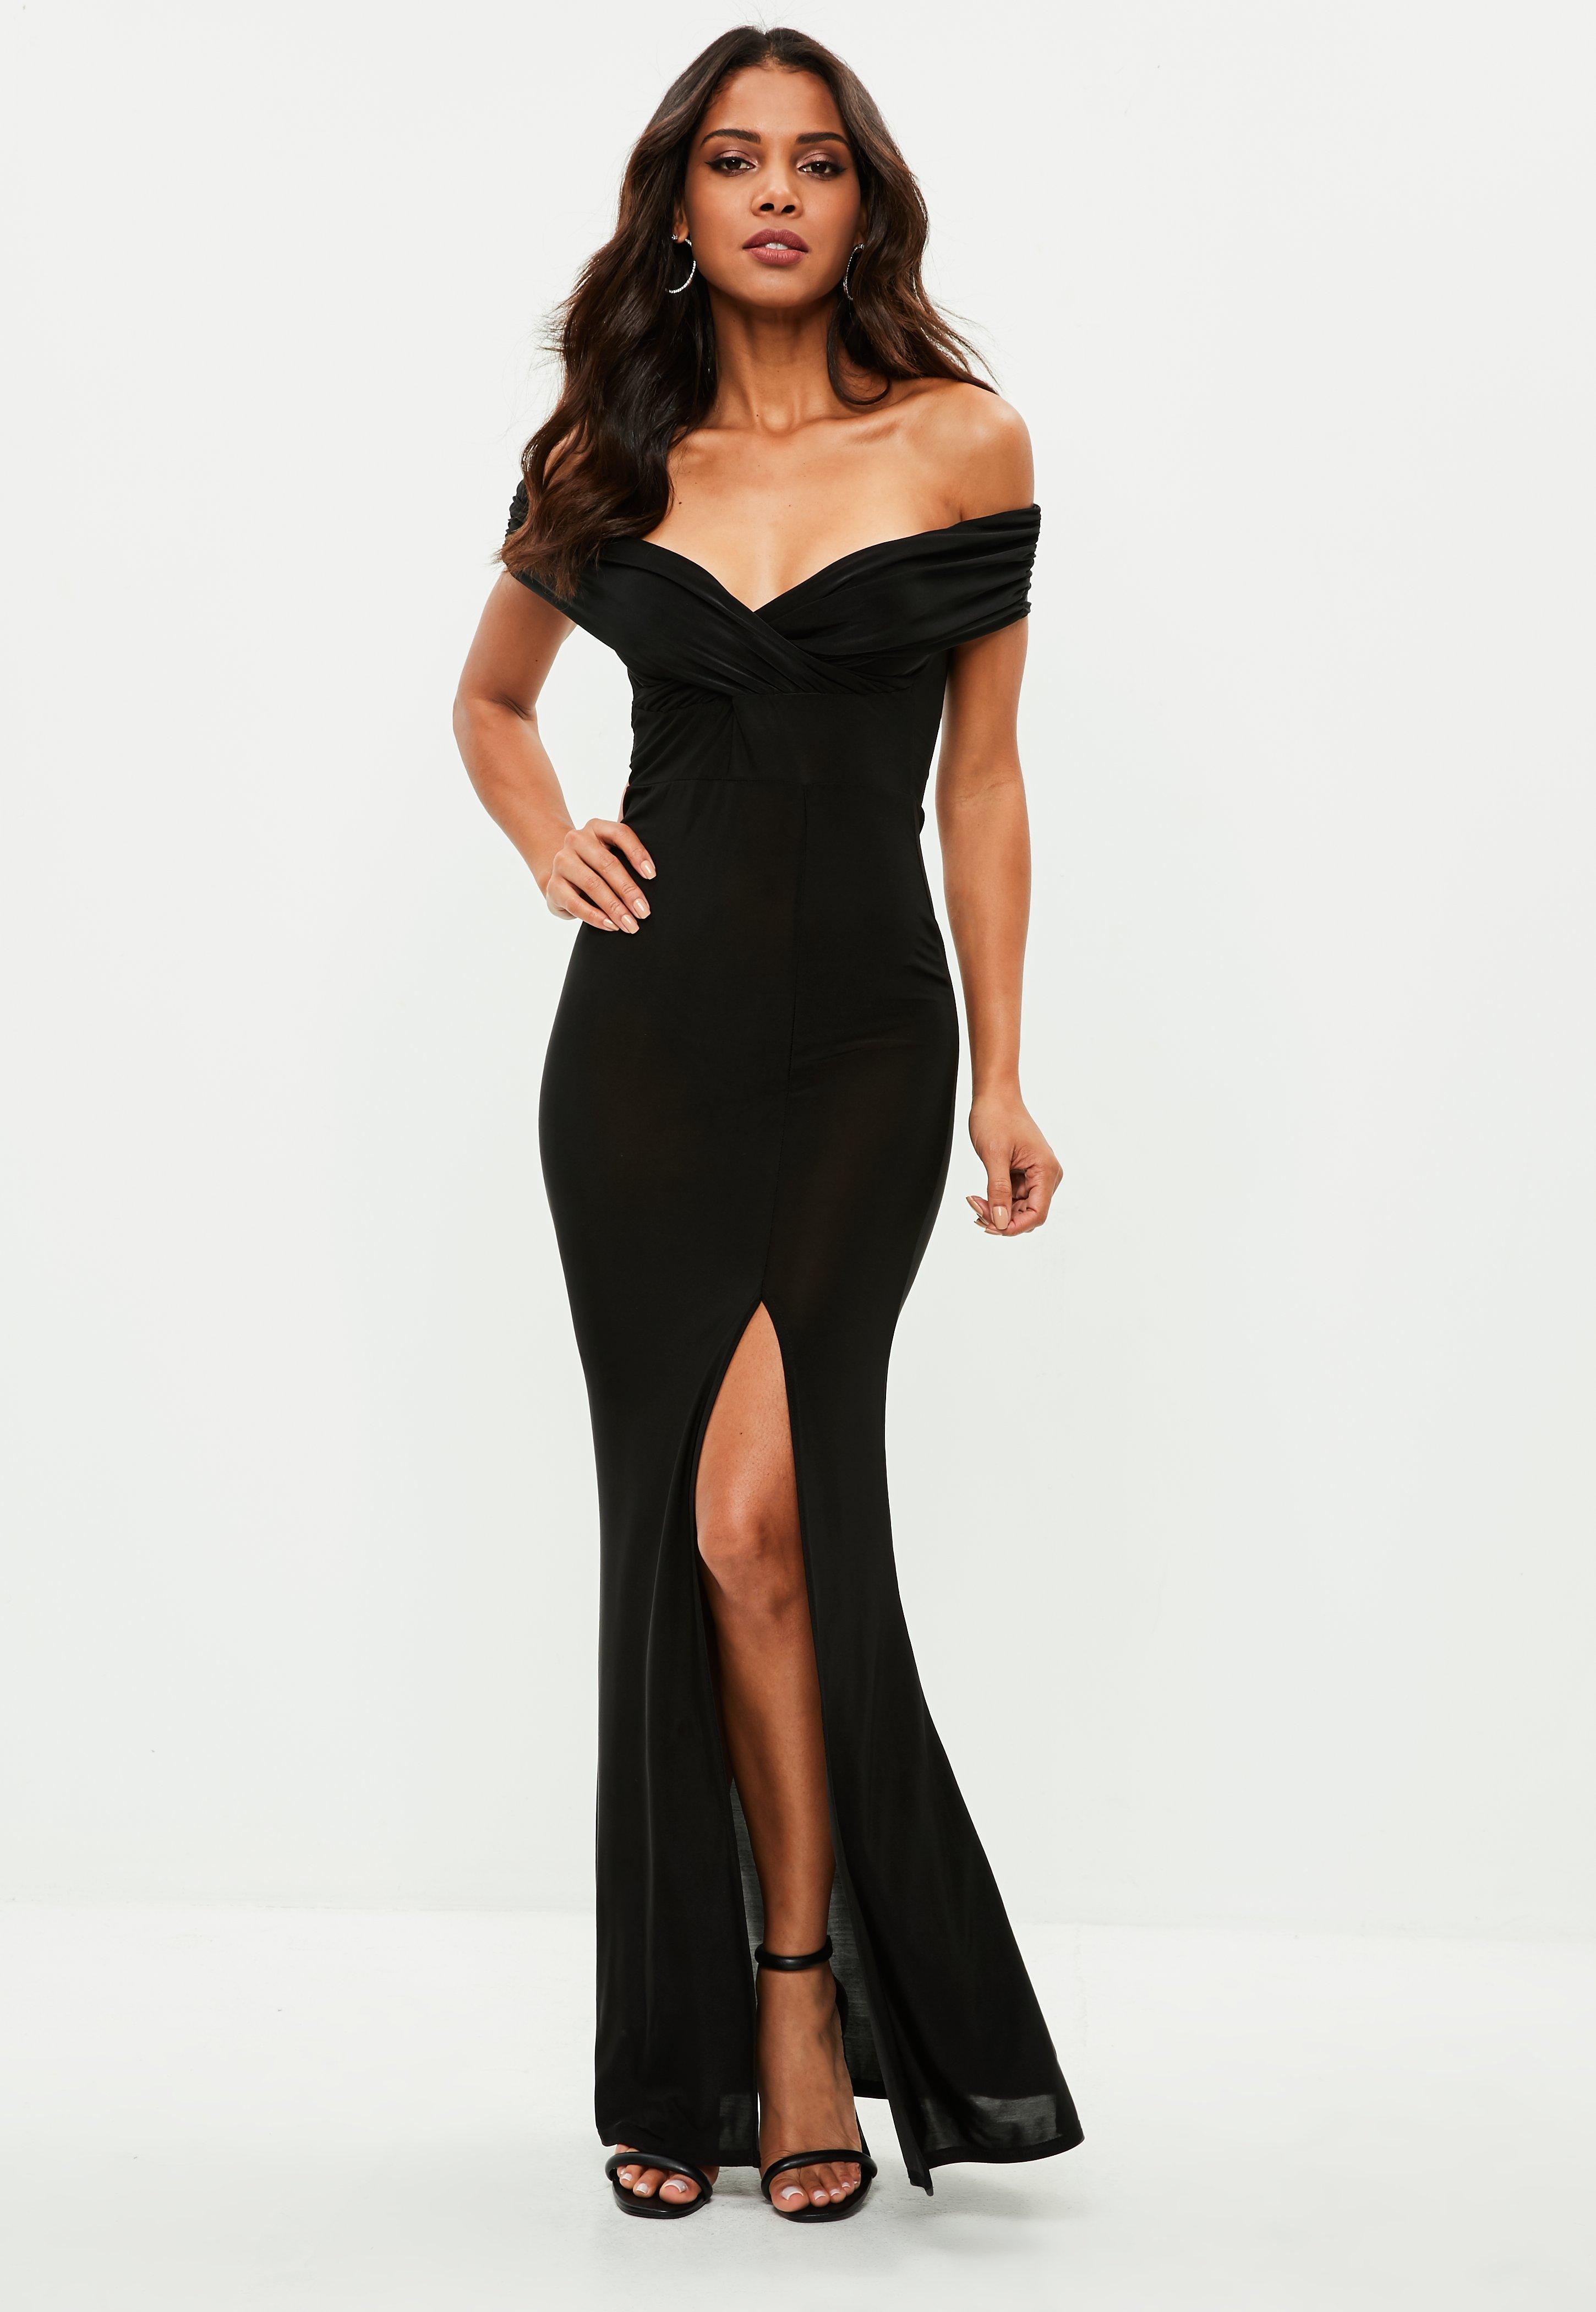 Longue robe noir fendue